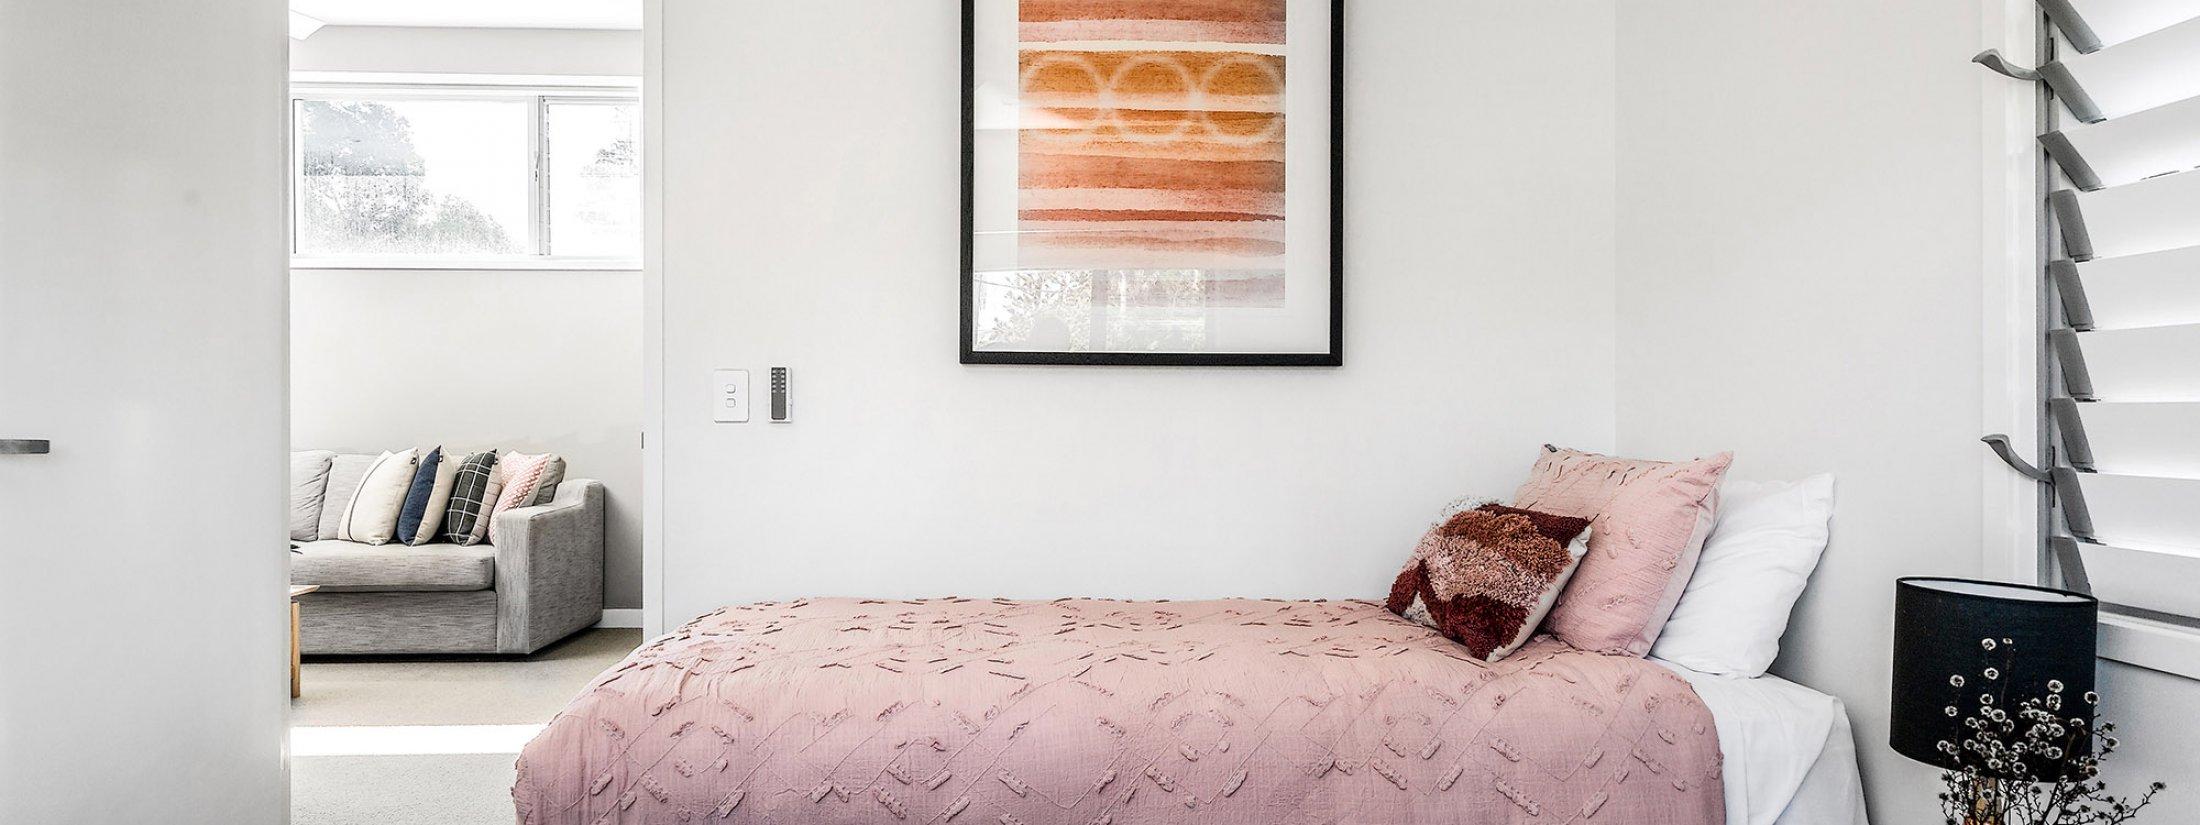 Kaylani Cove - Byron Bay - Bedroom 3a